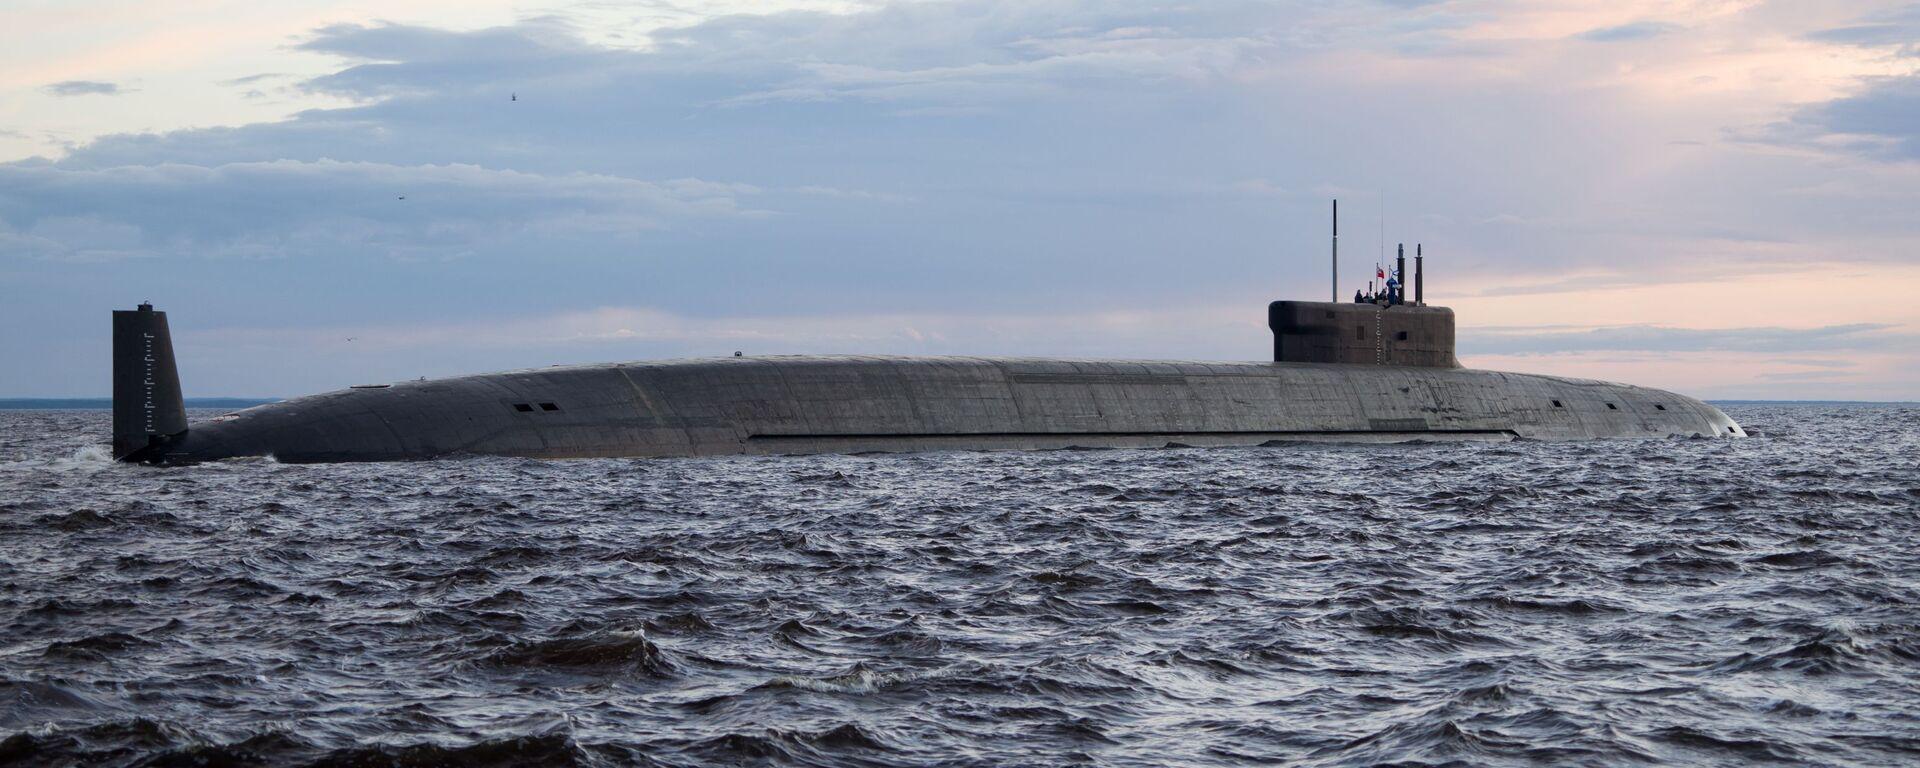 Il sottomarino Knyaz Vladimir - Sputnik Italia, 1920, 09.06.2021